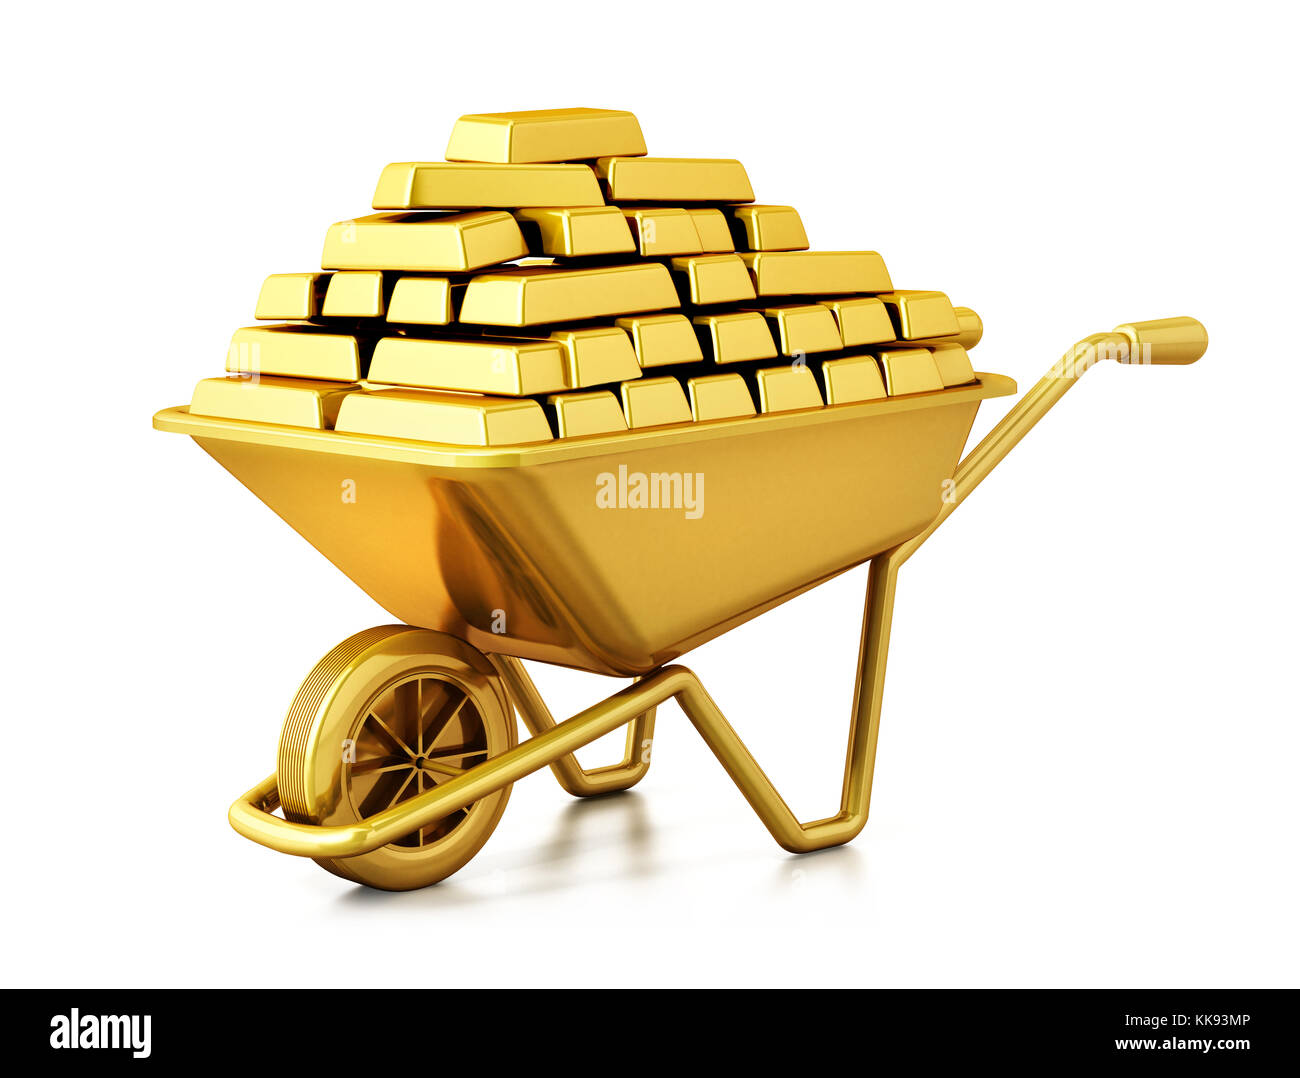 Wheelbarrow full of gold isolated on white background. 3D illustration. - Stock Image